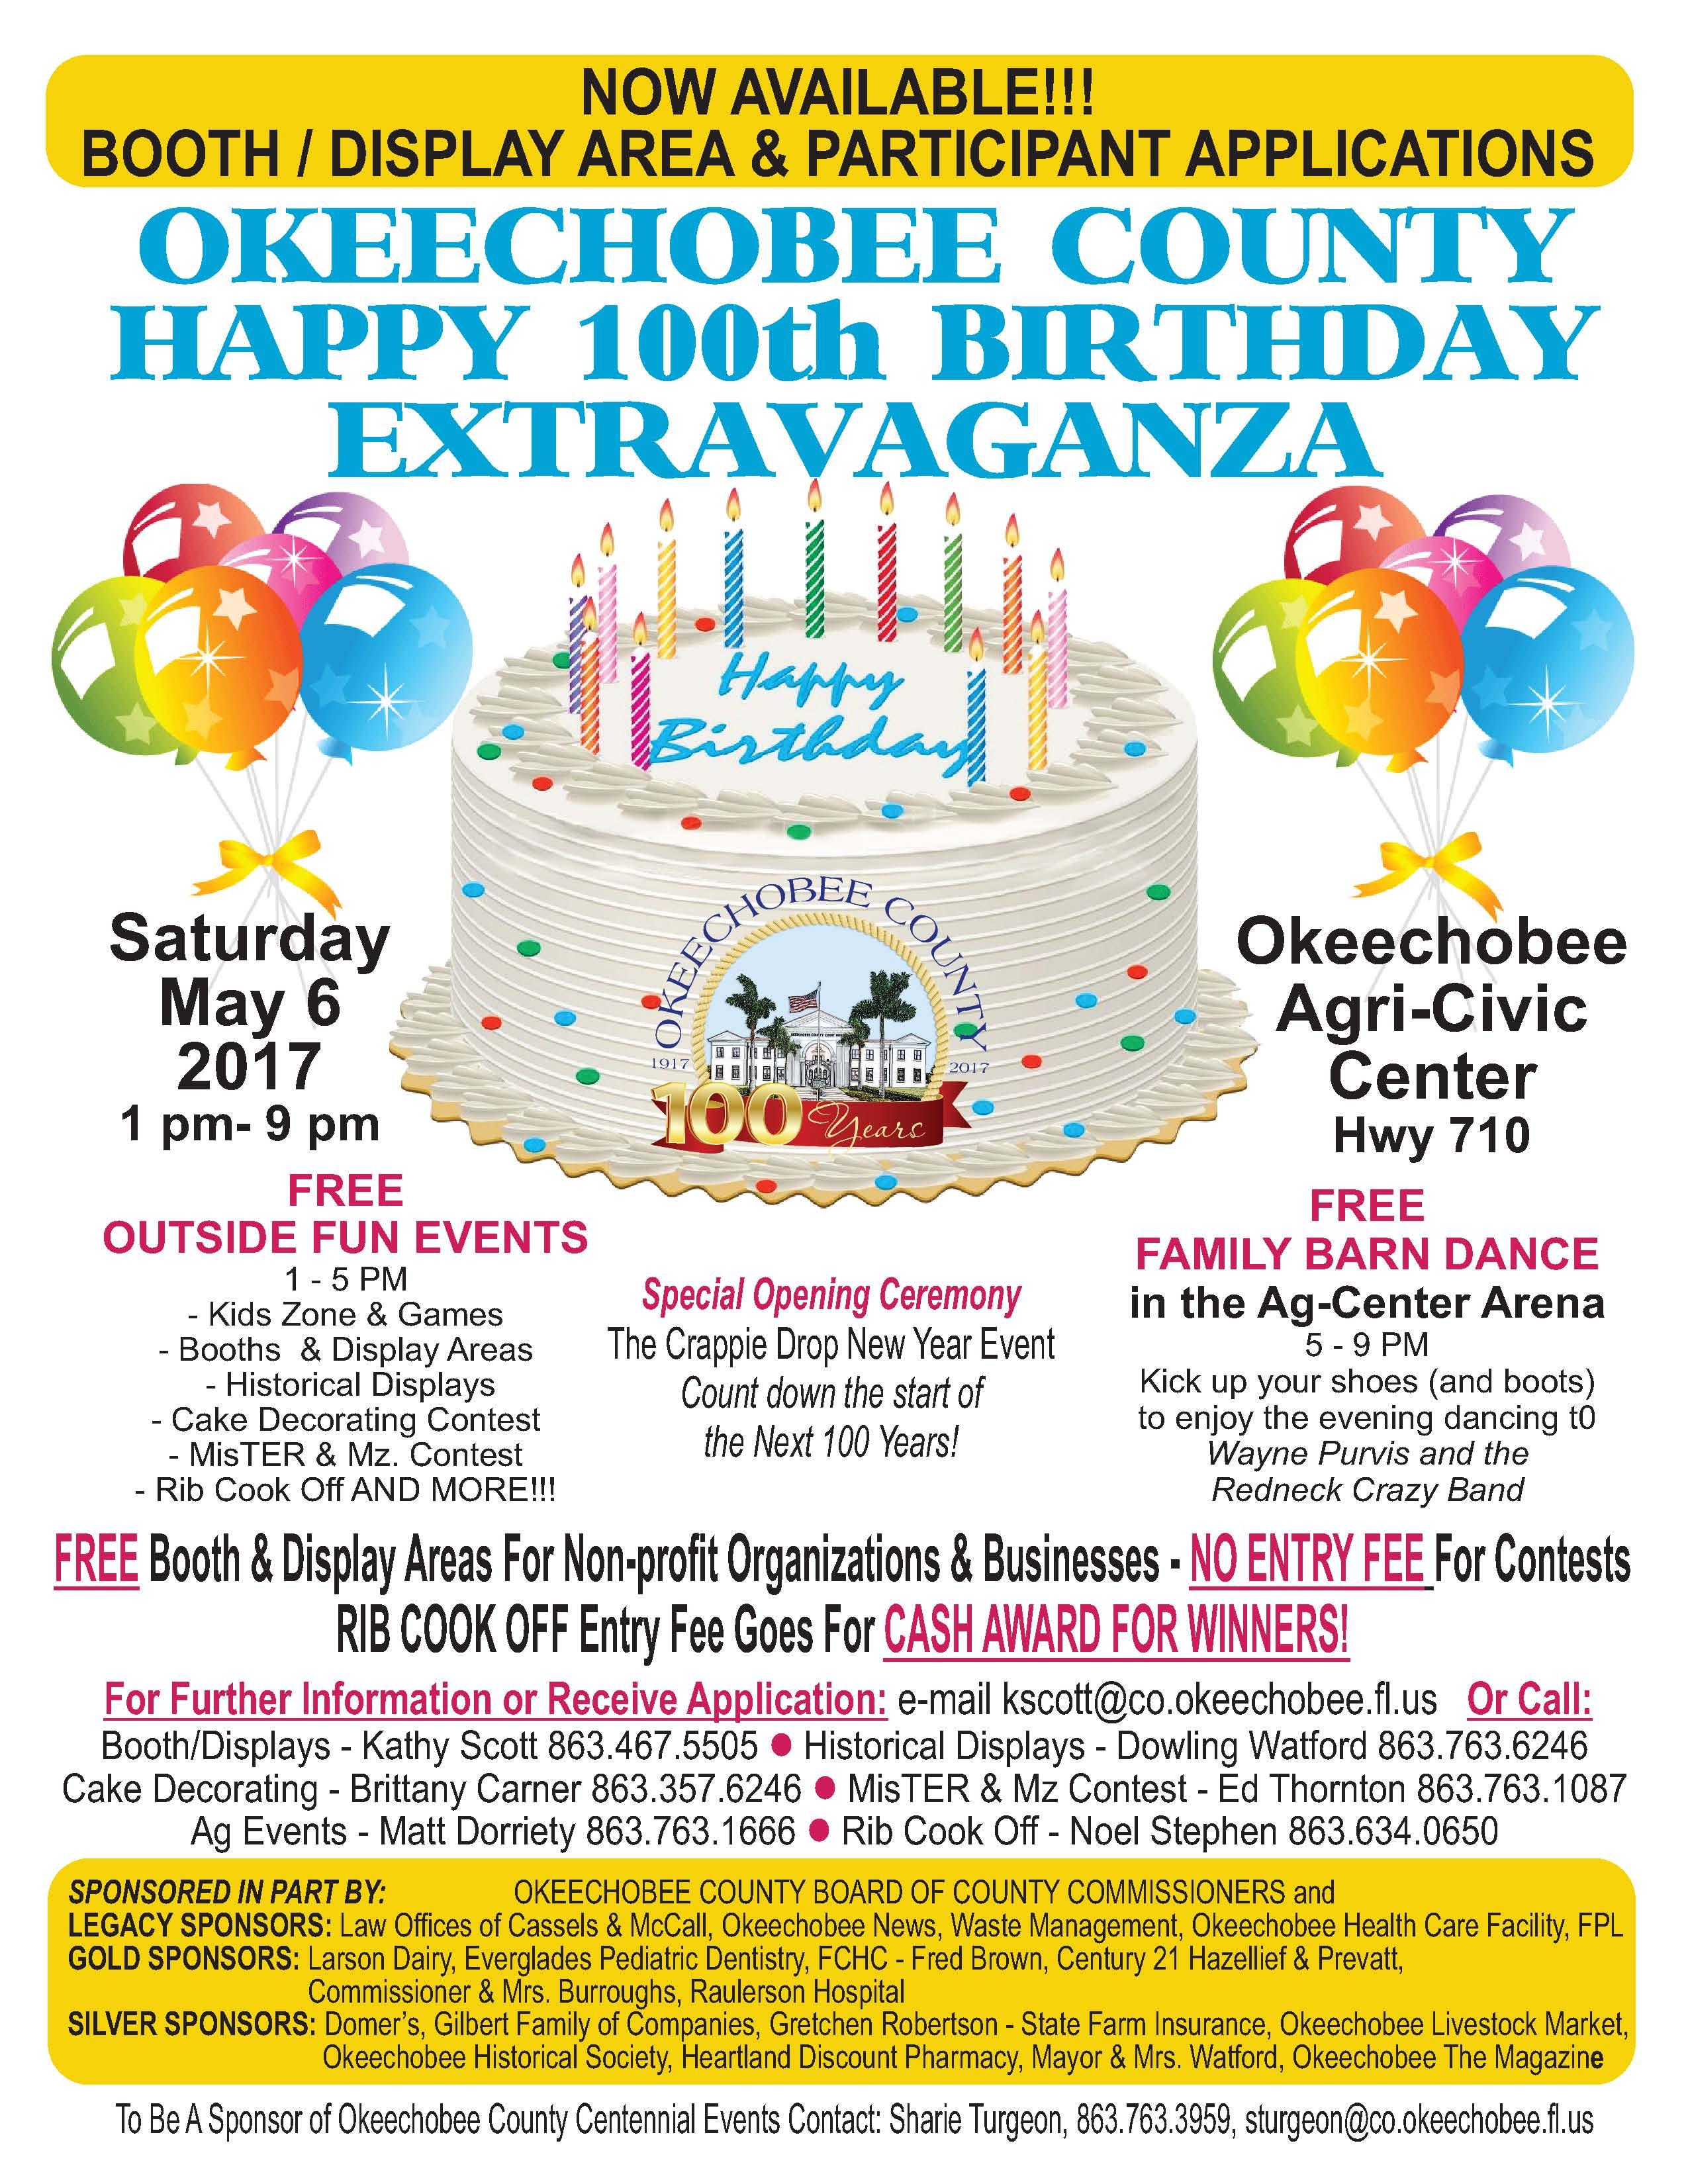 Birthday Application Flyer 2-8-17 (3).jpg